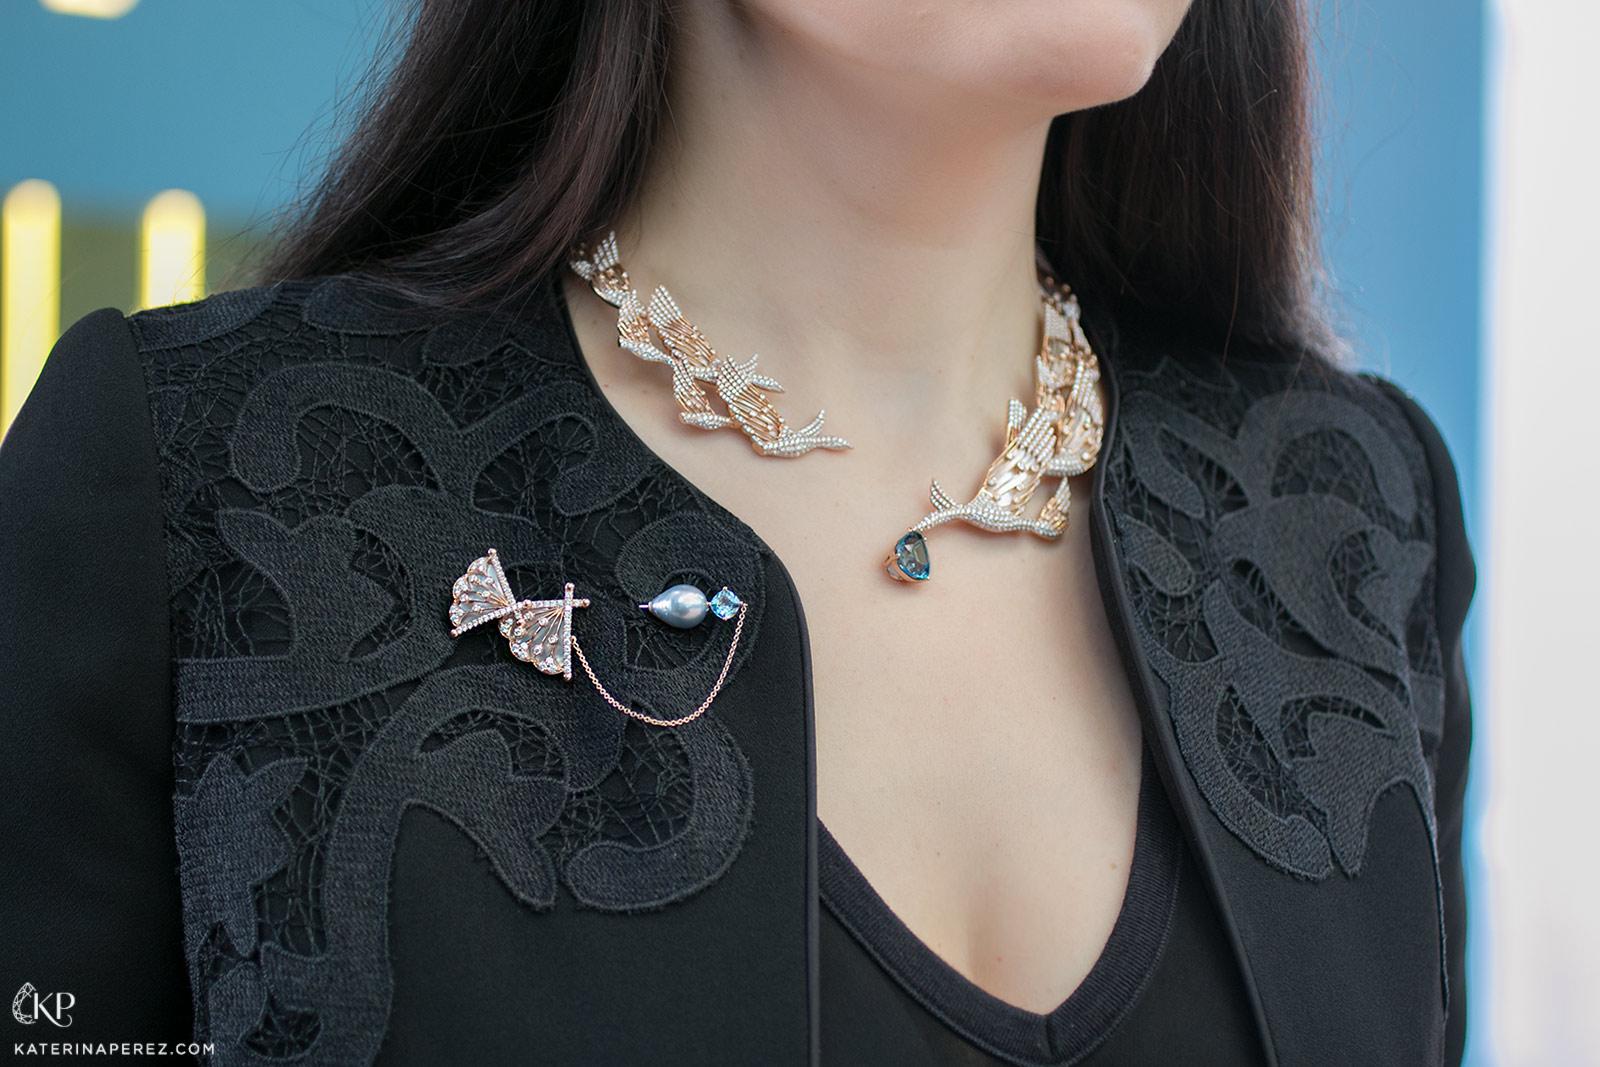 Брошь и колье Simone Jewels �Paradiso' из 18k розового золота  грушевидным аквамарином 7.60ct Santa Maria, бриллиантами и перламутром